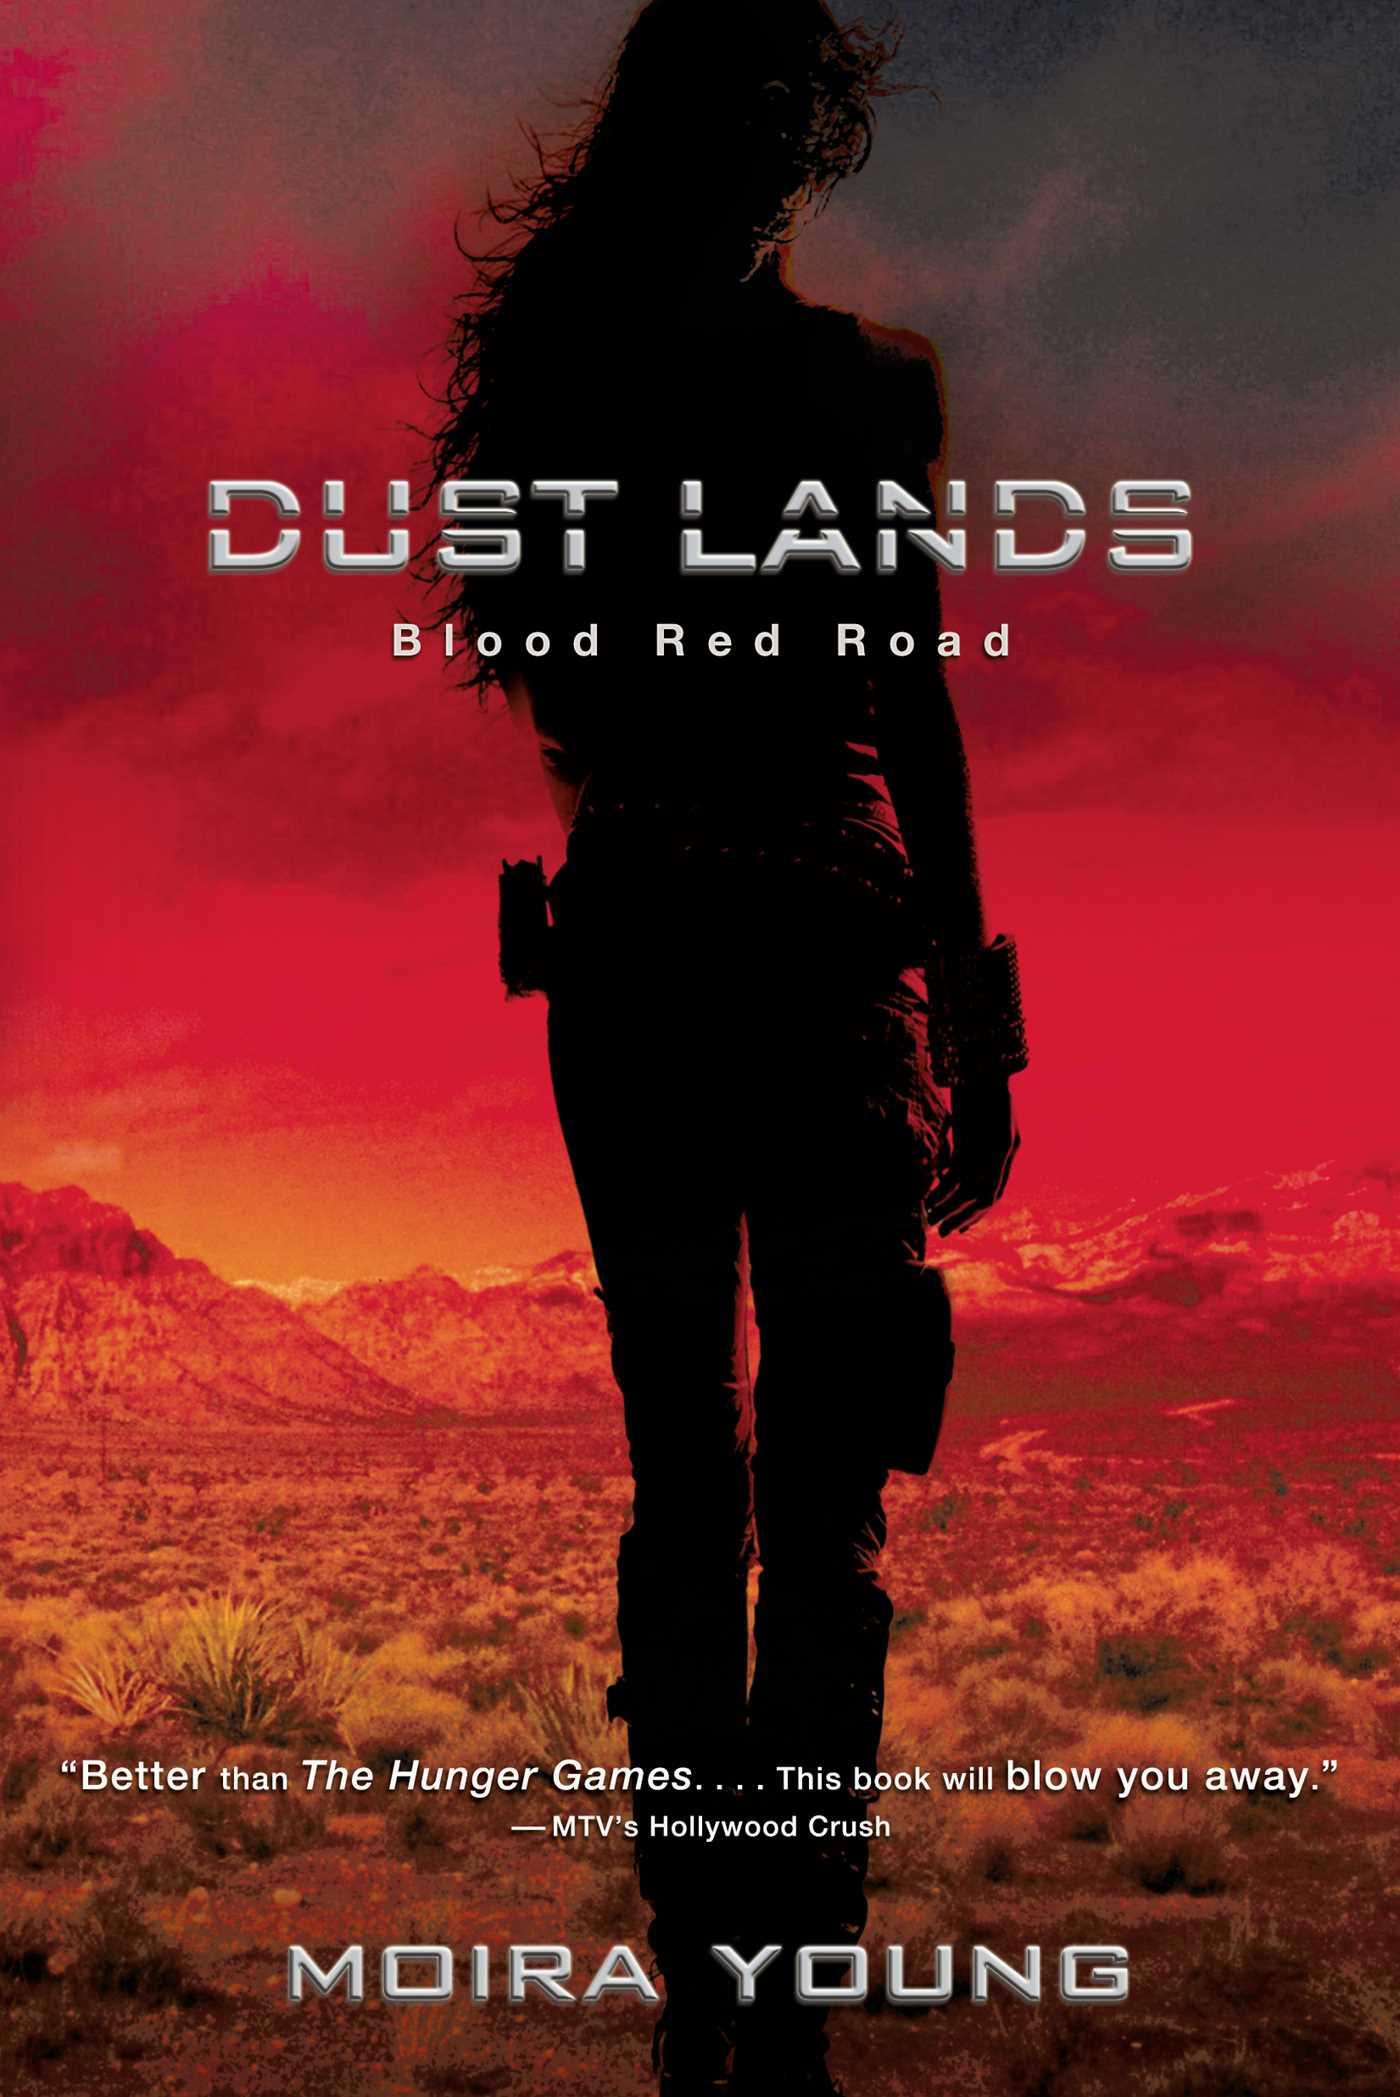 Blood red road 9781442433397 hr